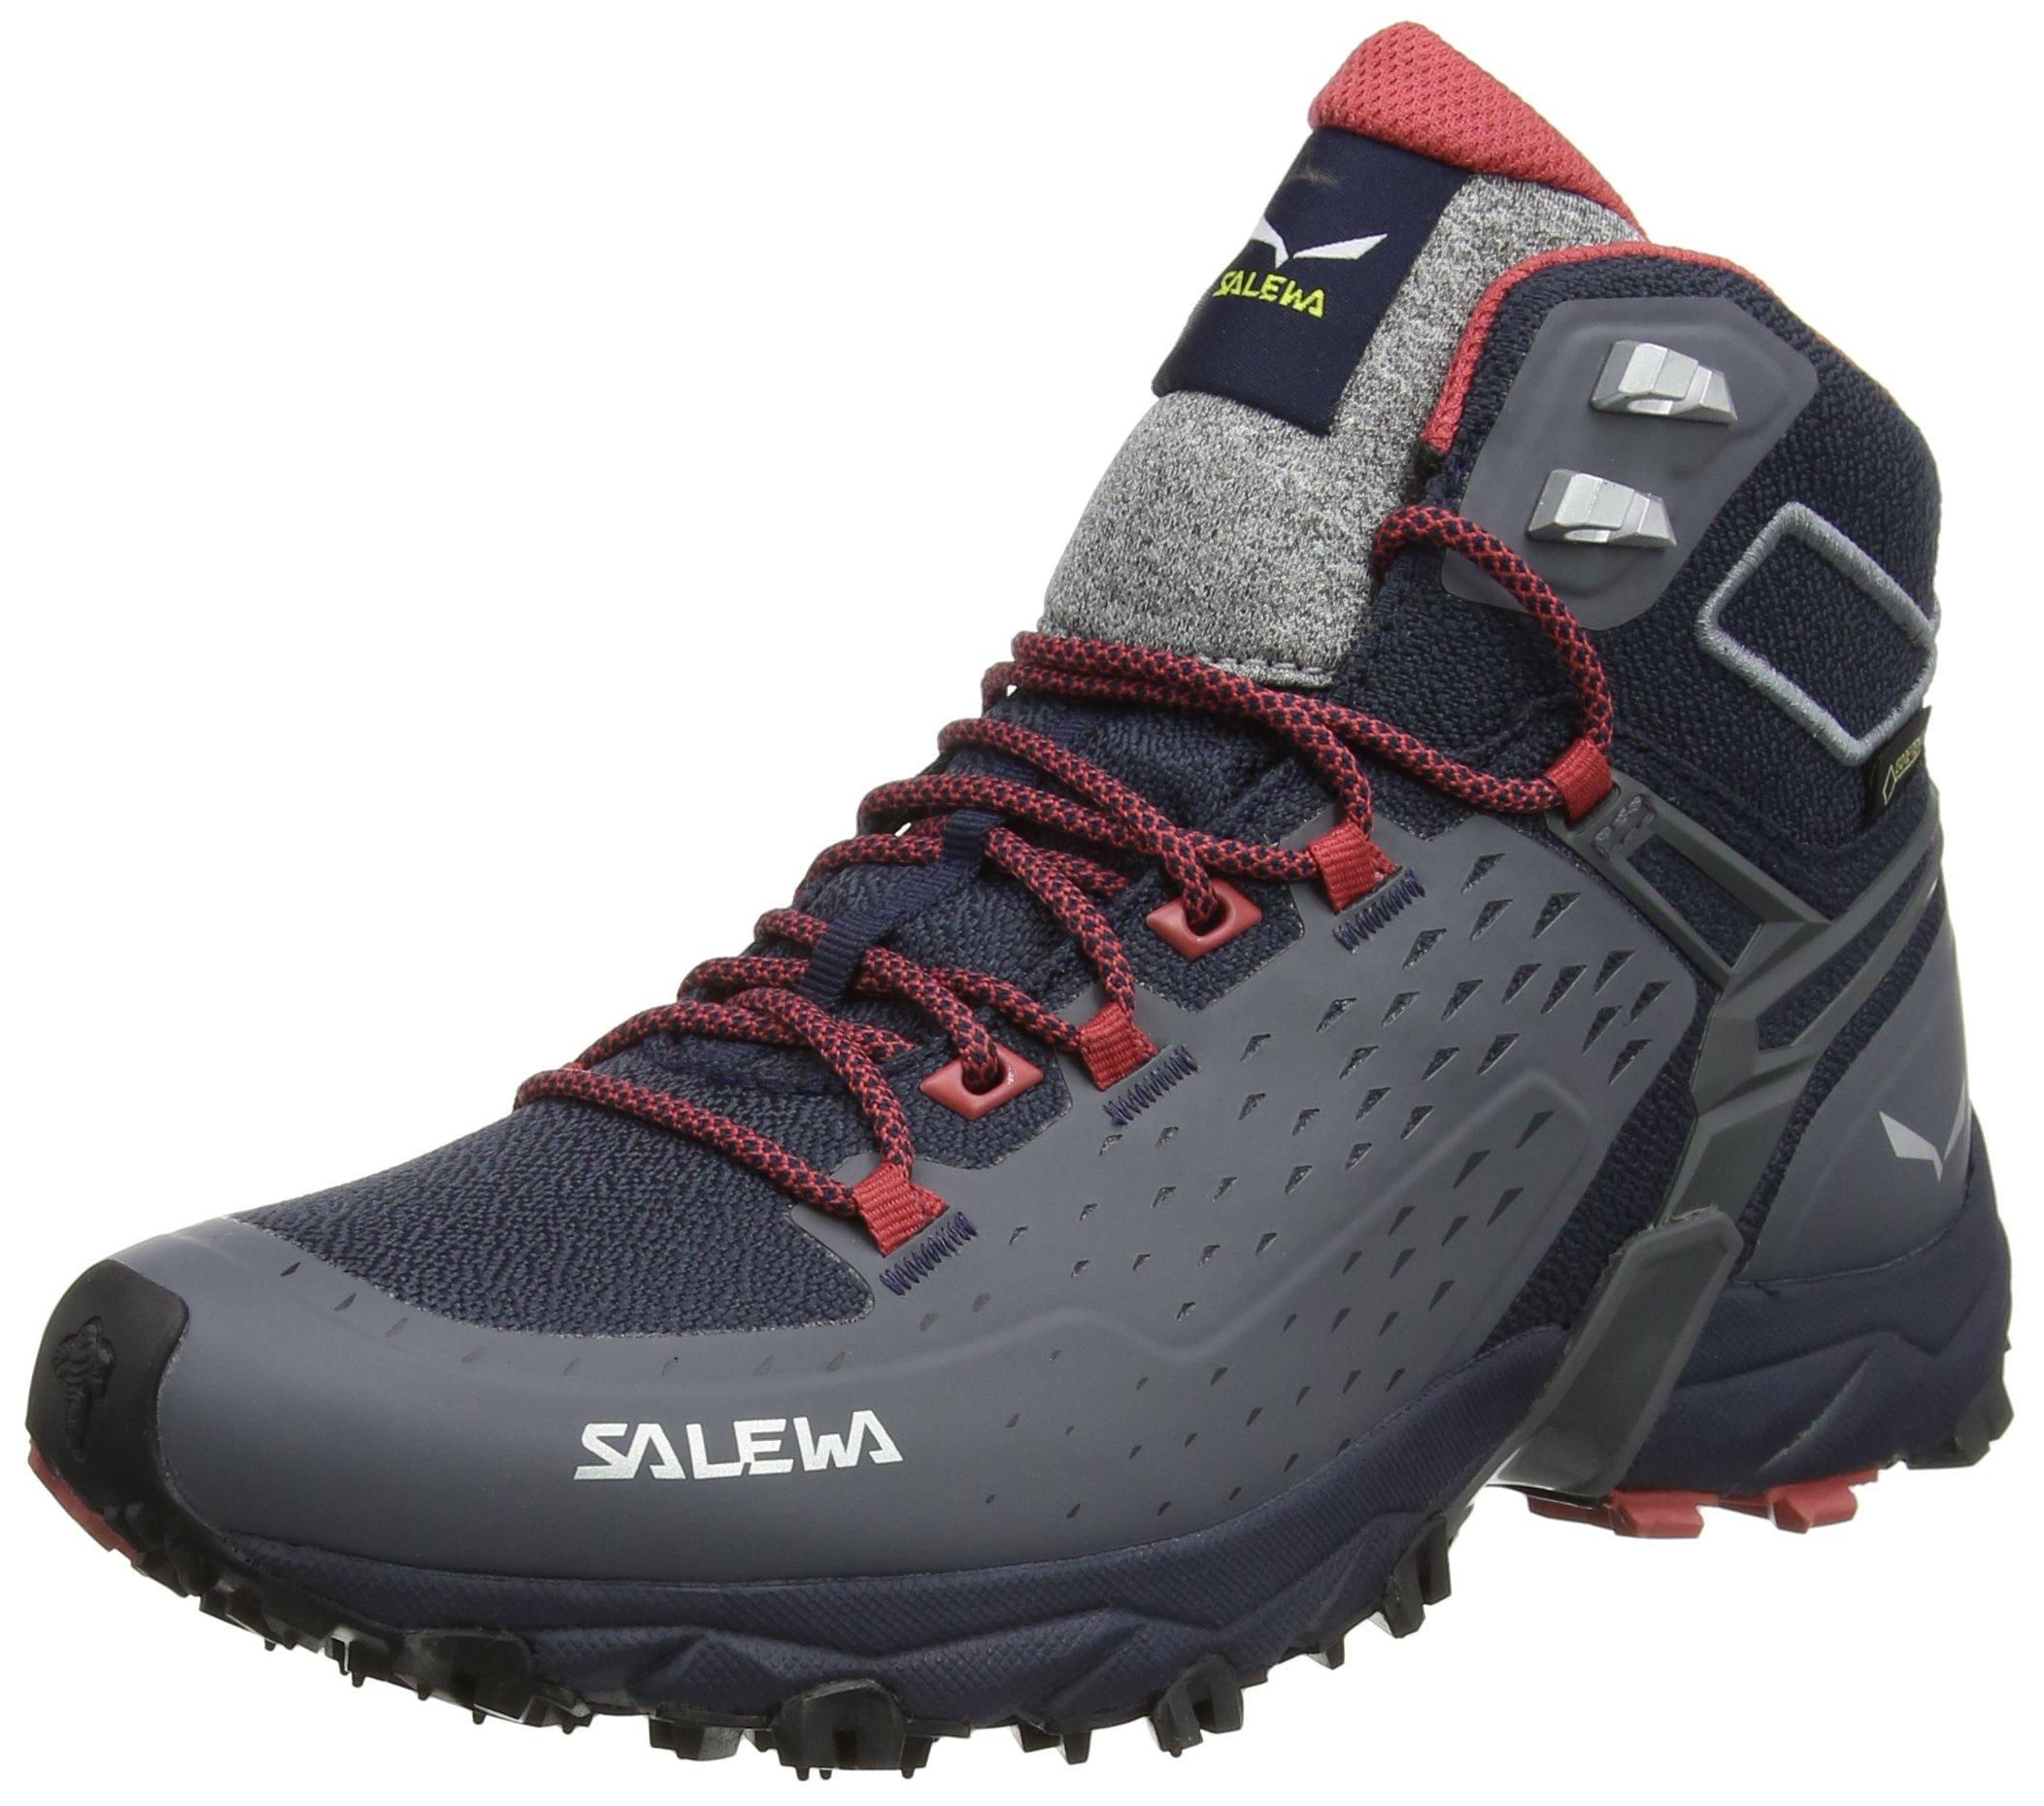 Salewa Women's Alpenrose Ultra Mid GTX Speed Hiking Shoe, Night Black/Mineral Red, 6